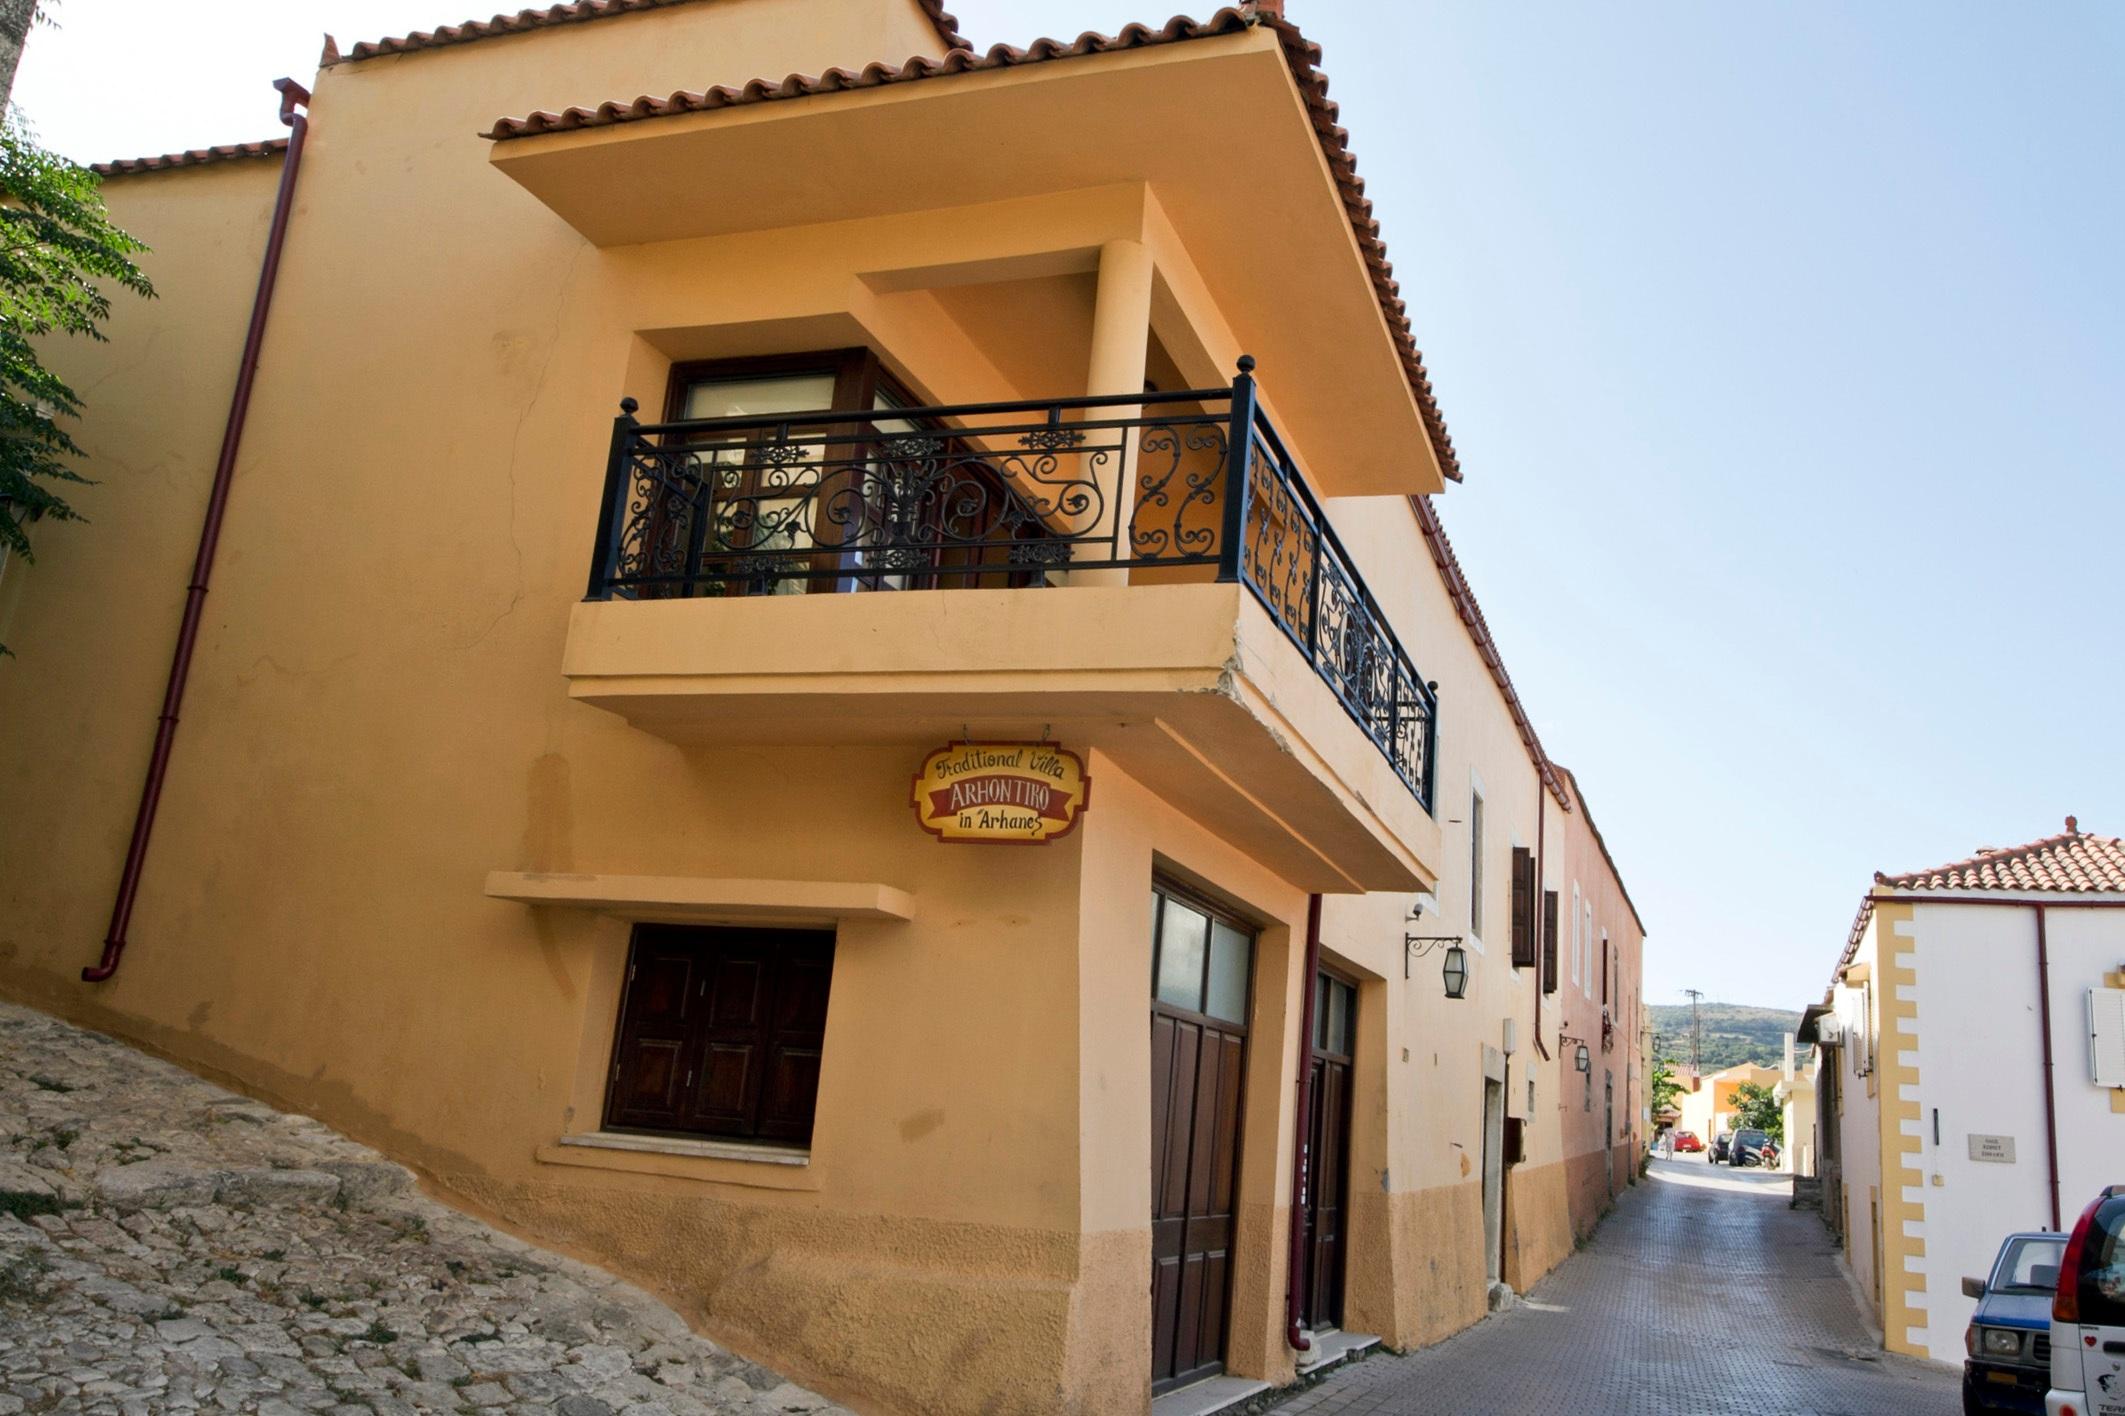 Arhontiko_In_Archanes%2C_Crete%2C_Greece_-_panoramio.jpg